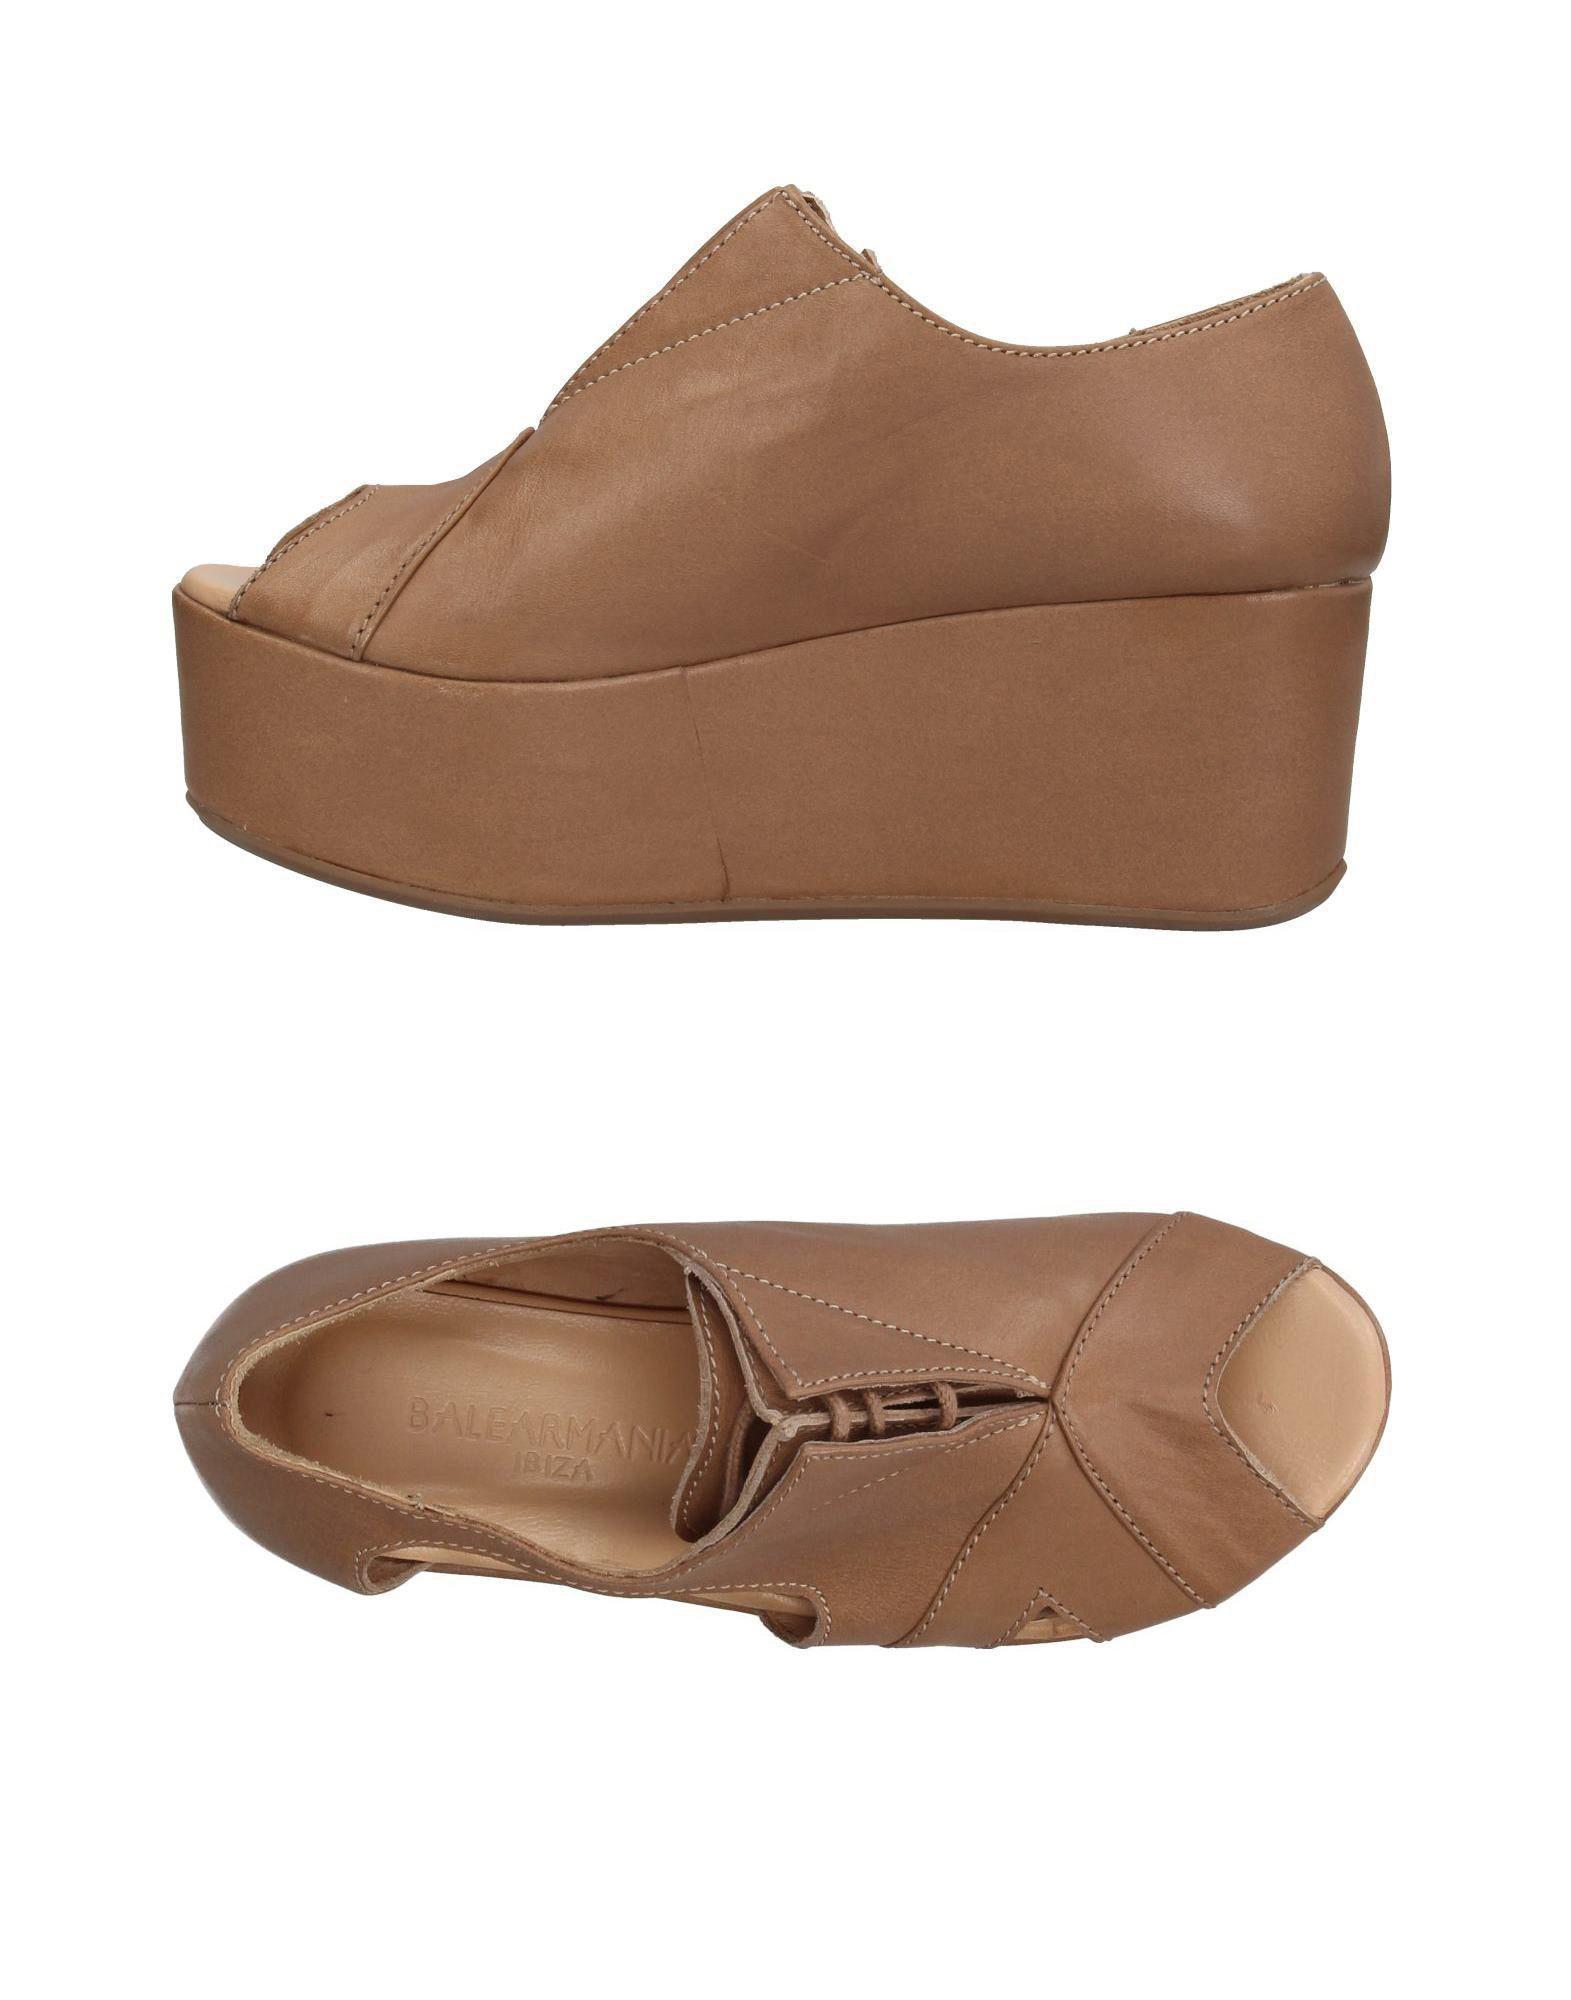 Mania Balear De Chaussures À Lacets UF73x0WU